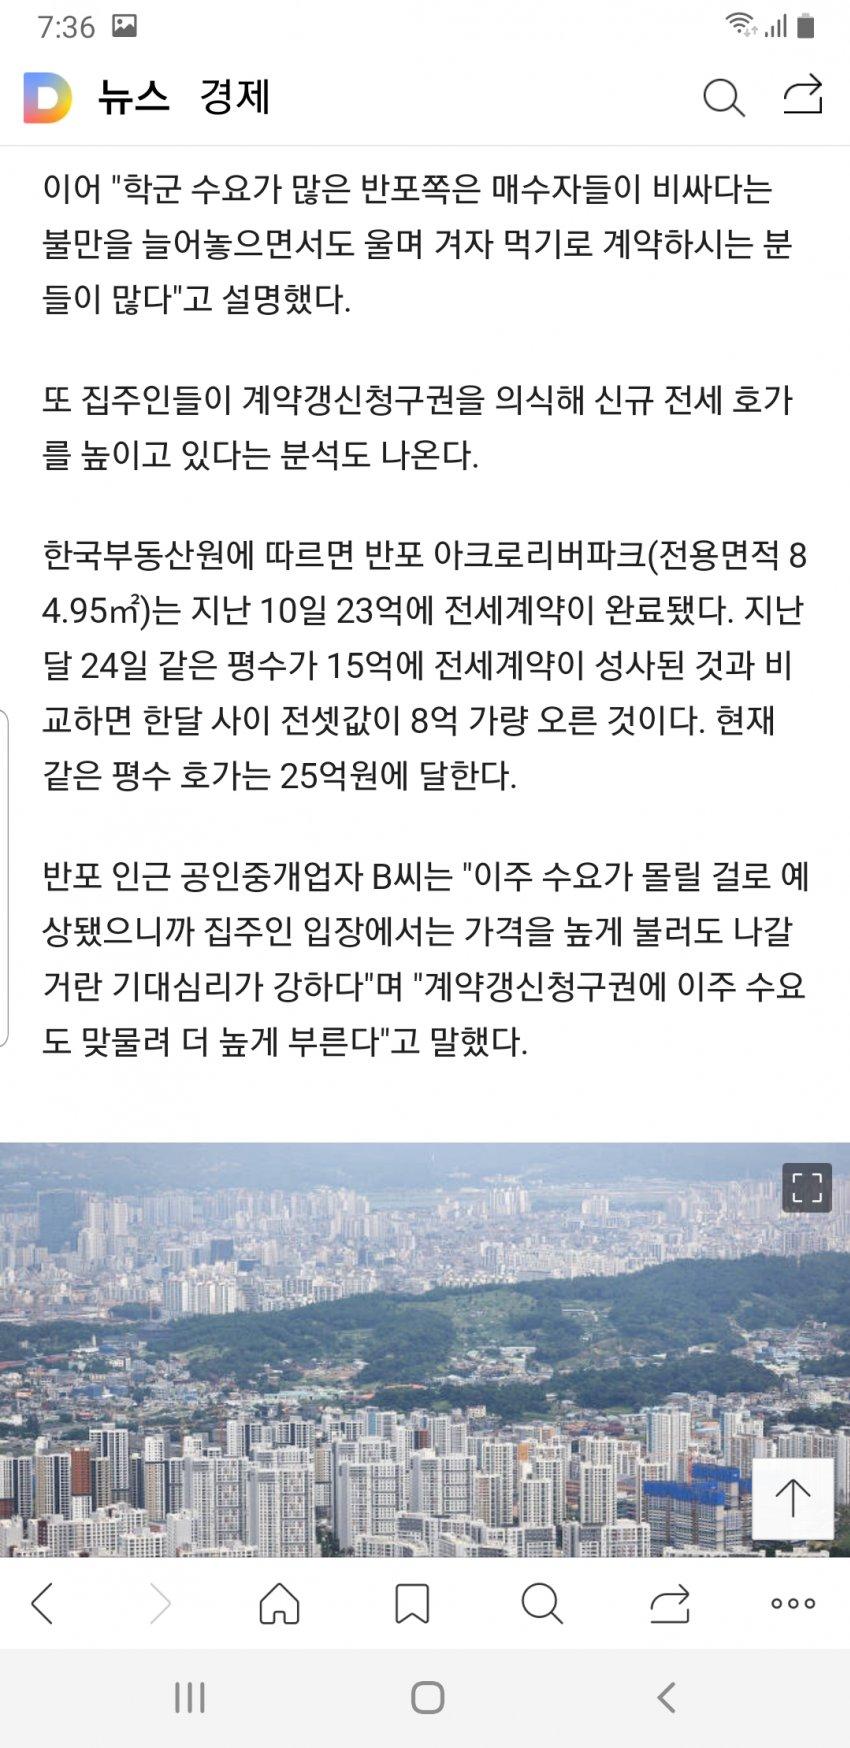 viewimage.php?id=2cb1d329eddd34&no=24b0d769e1d32ca73fec8ffa11d0283194eeae3ea3f7d0da351cf9d343817010ec4721873fbe48ad25014bc099323d47ee178f98c83ba5bf5aba3f55328e716ff293fffb371ebae230ba1e0a7b55228f9f7403b51372f0845e030894cc